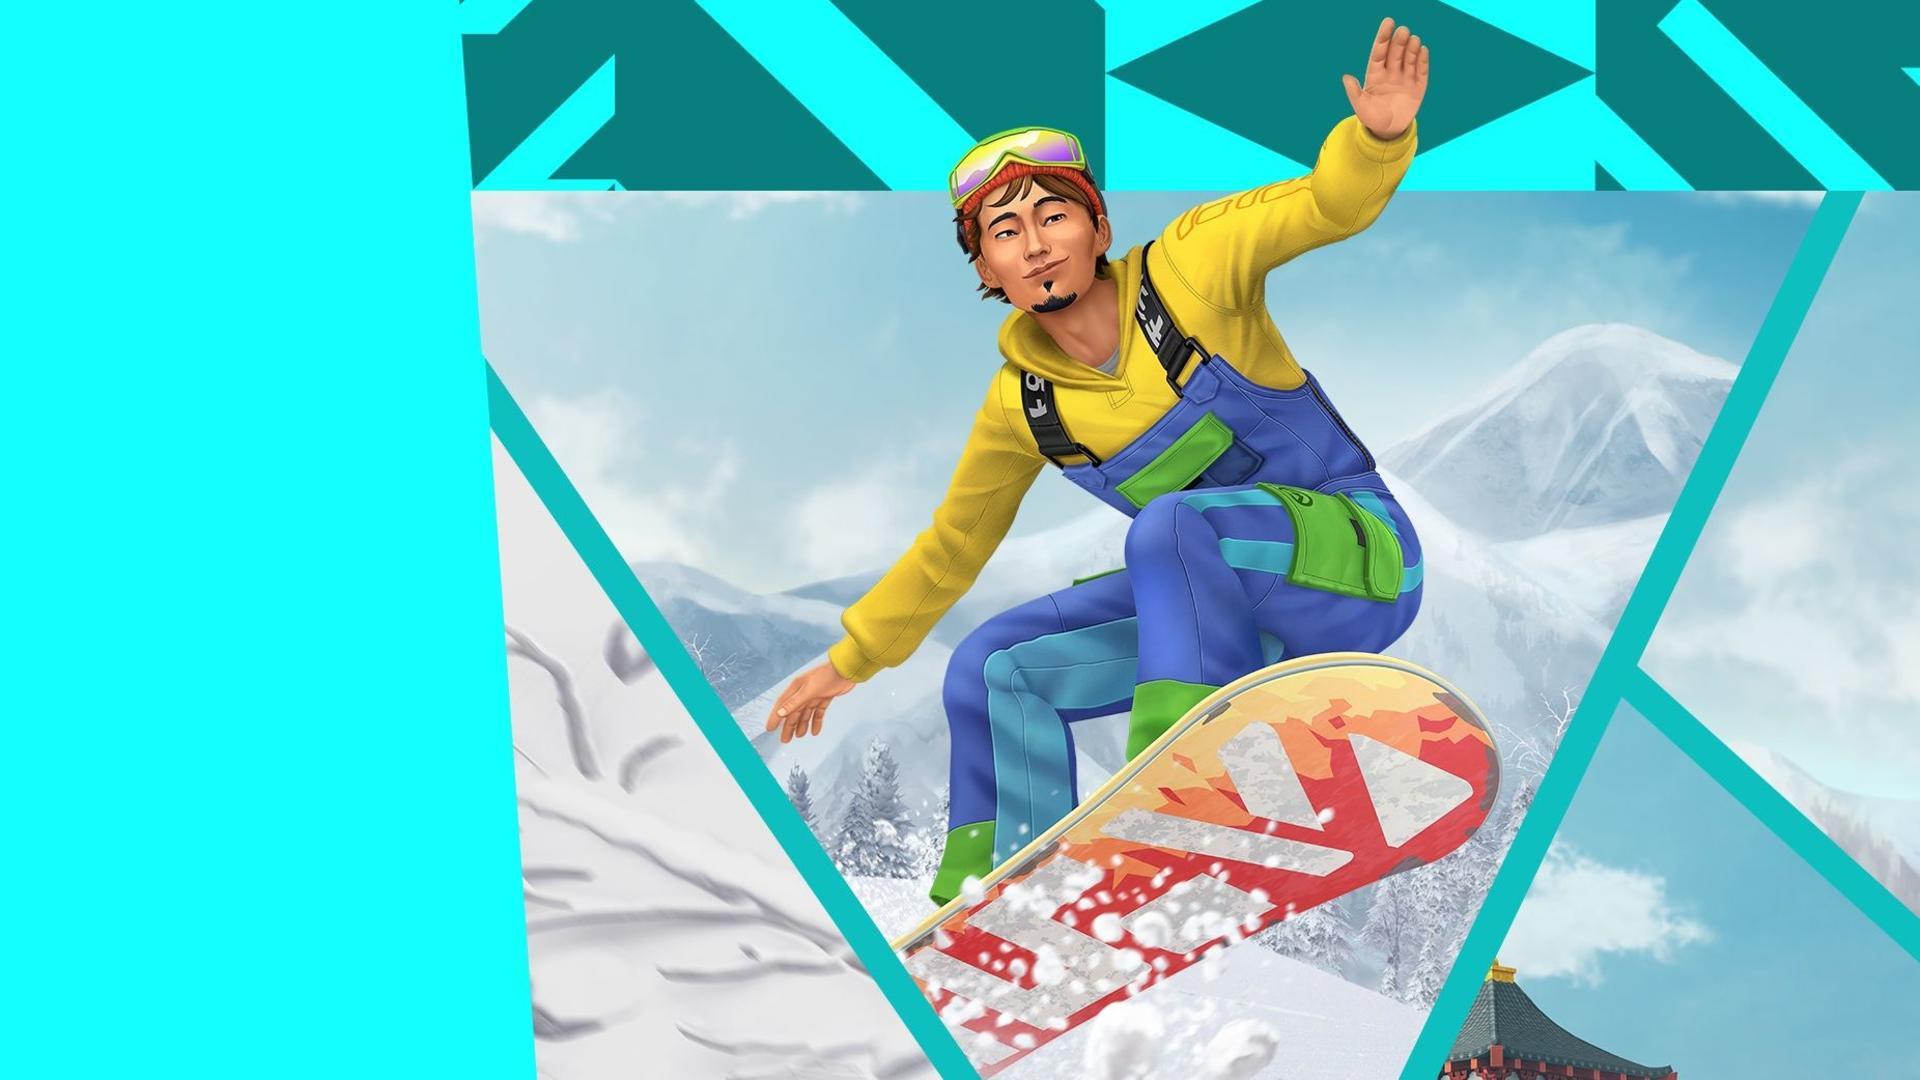 the sims 4 snowy escape game wallpaper 73073